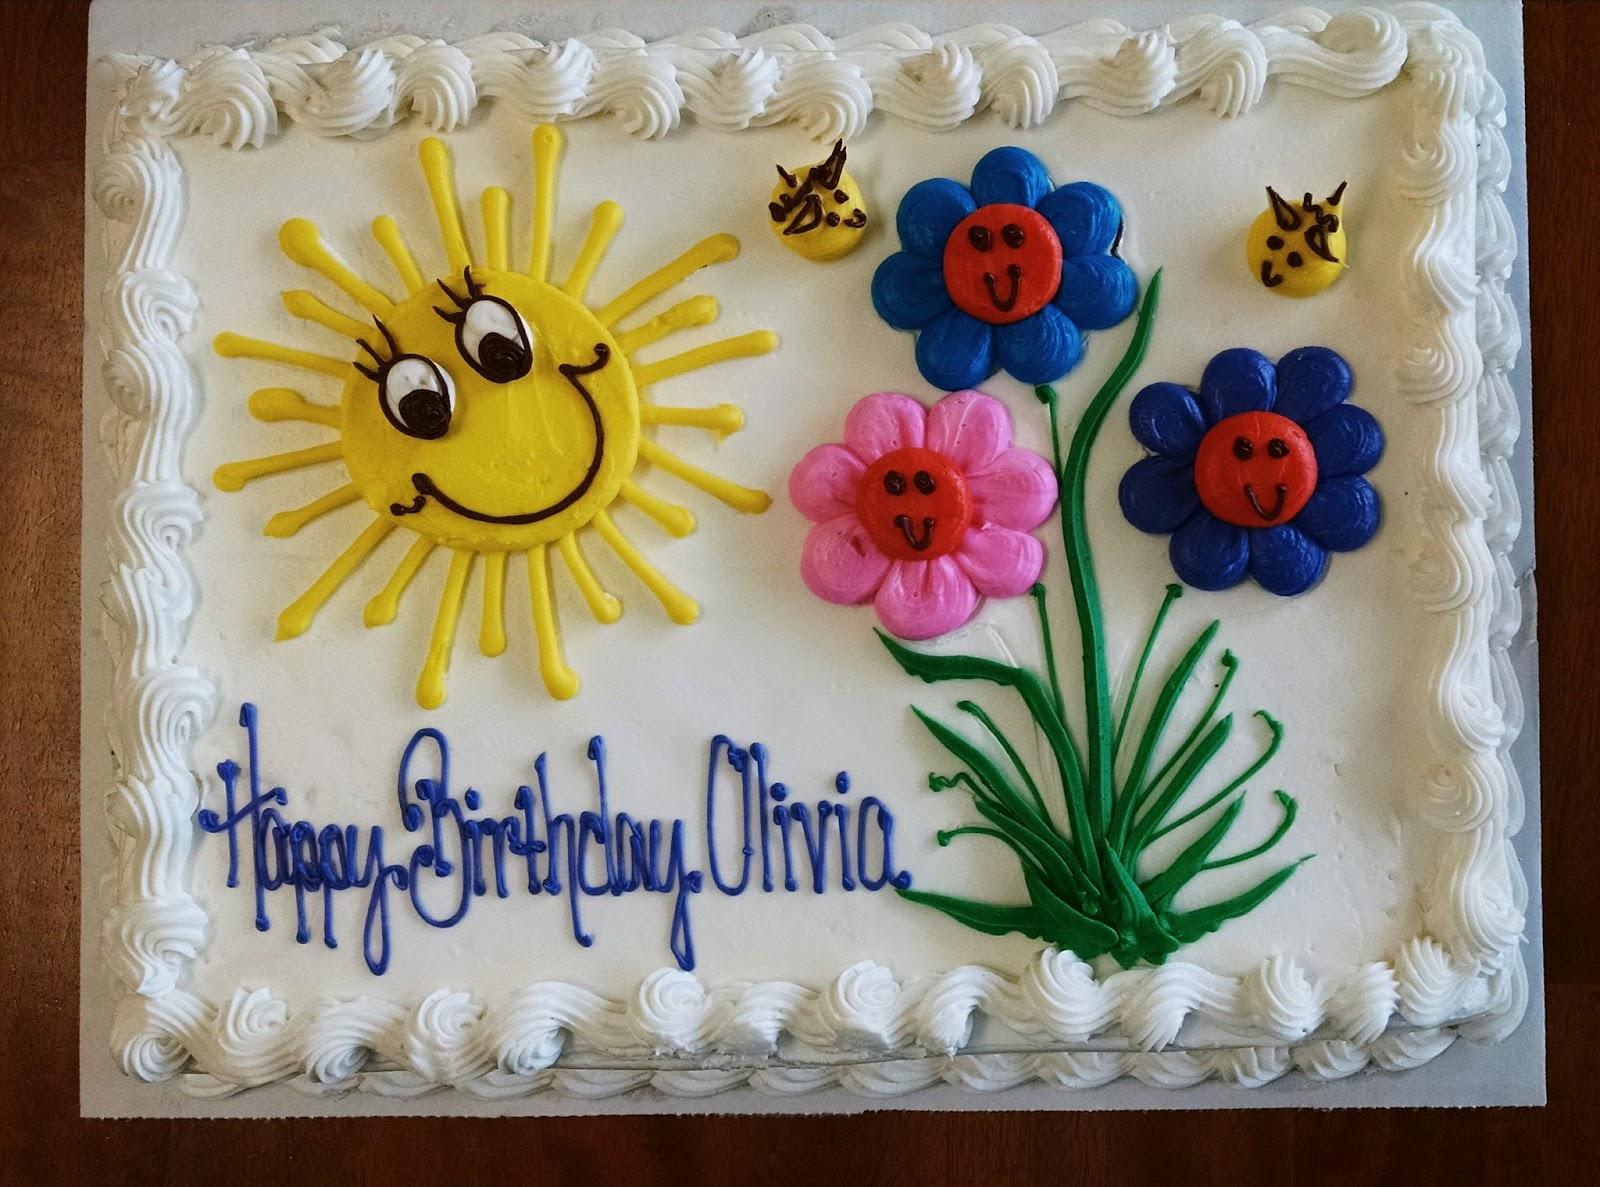 Happy Birthday Baby Girl Cake Images